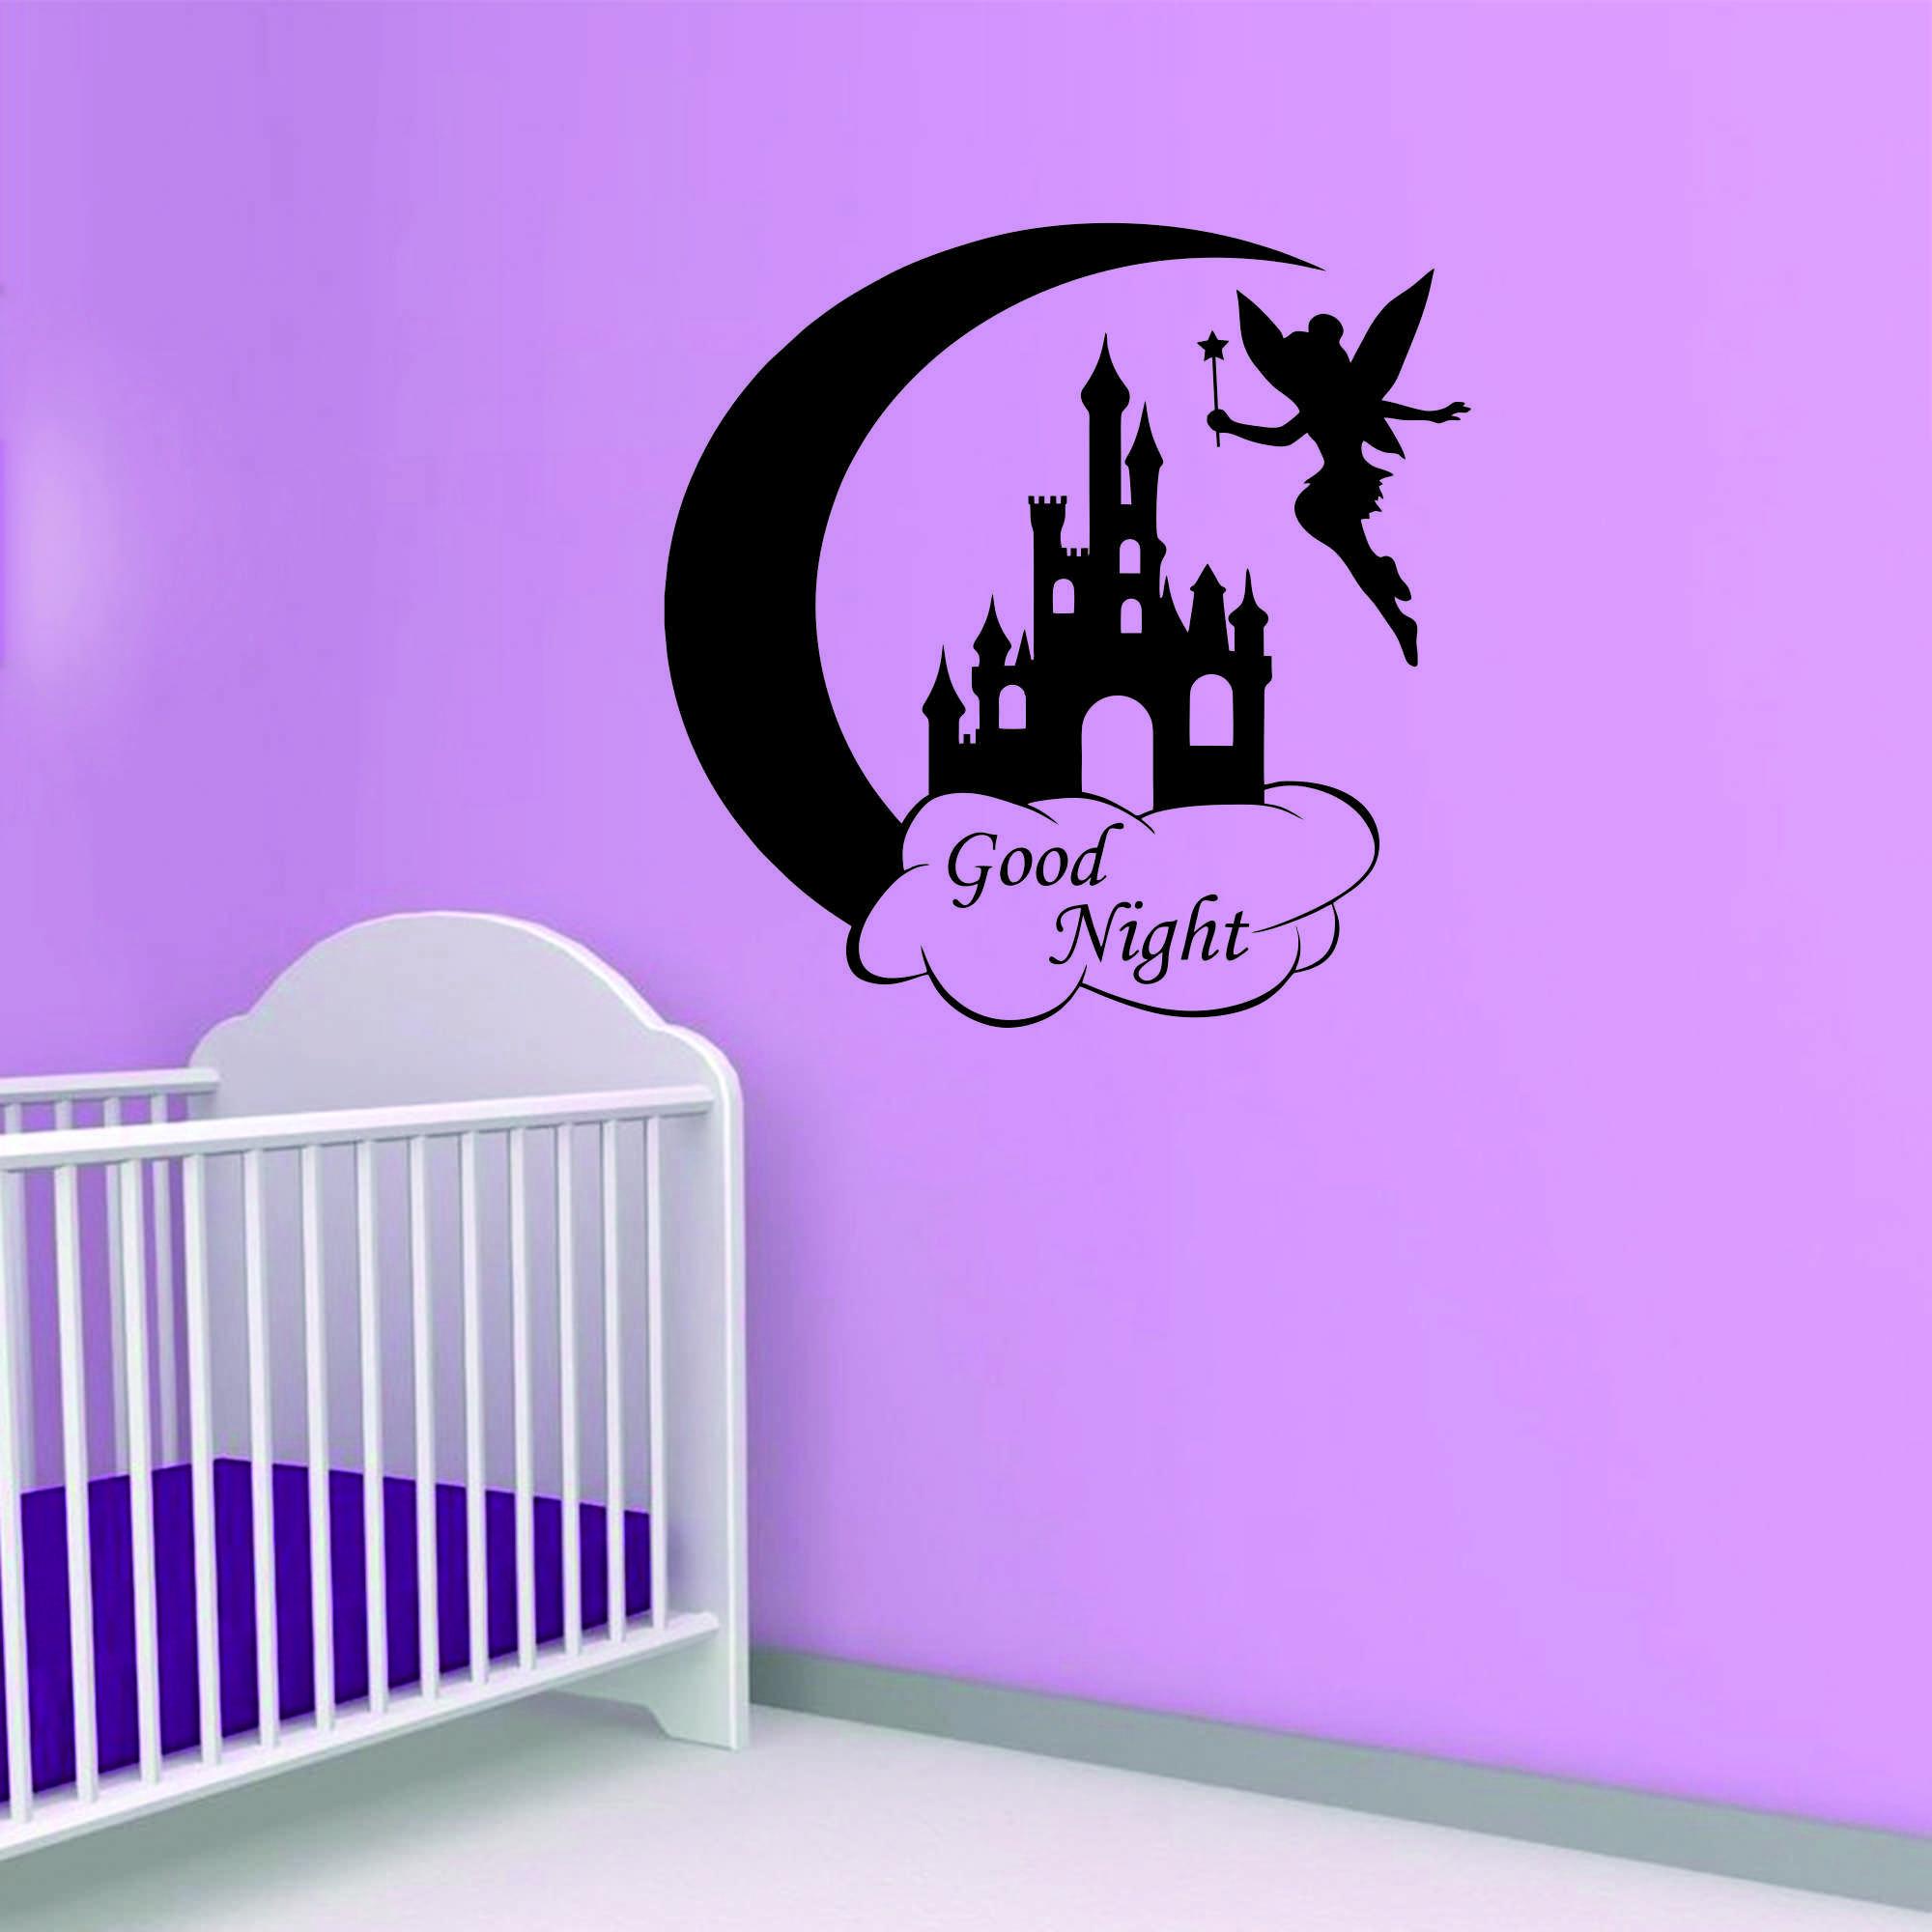 Samolepka na zeď - Good night nápis - 120x120 cm - PopyDesign